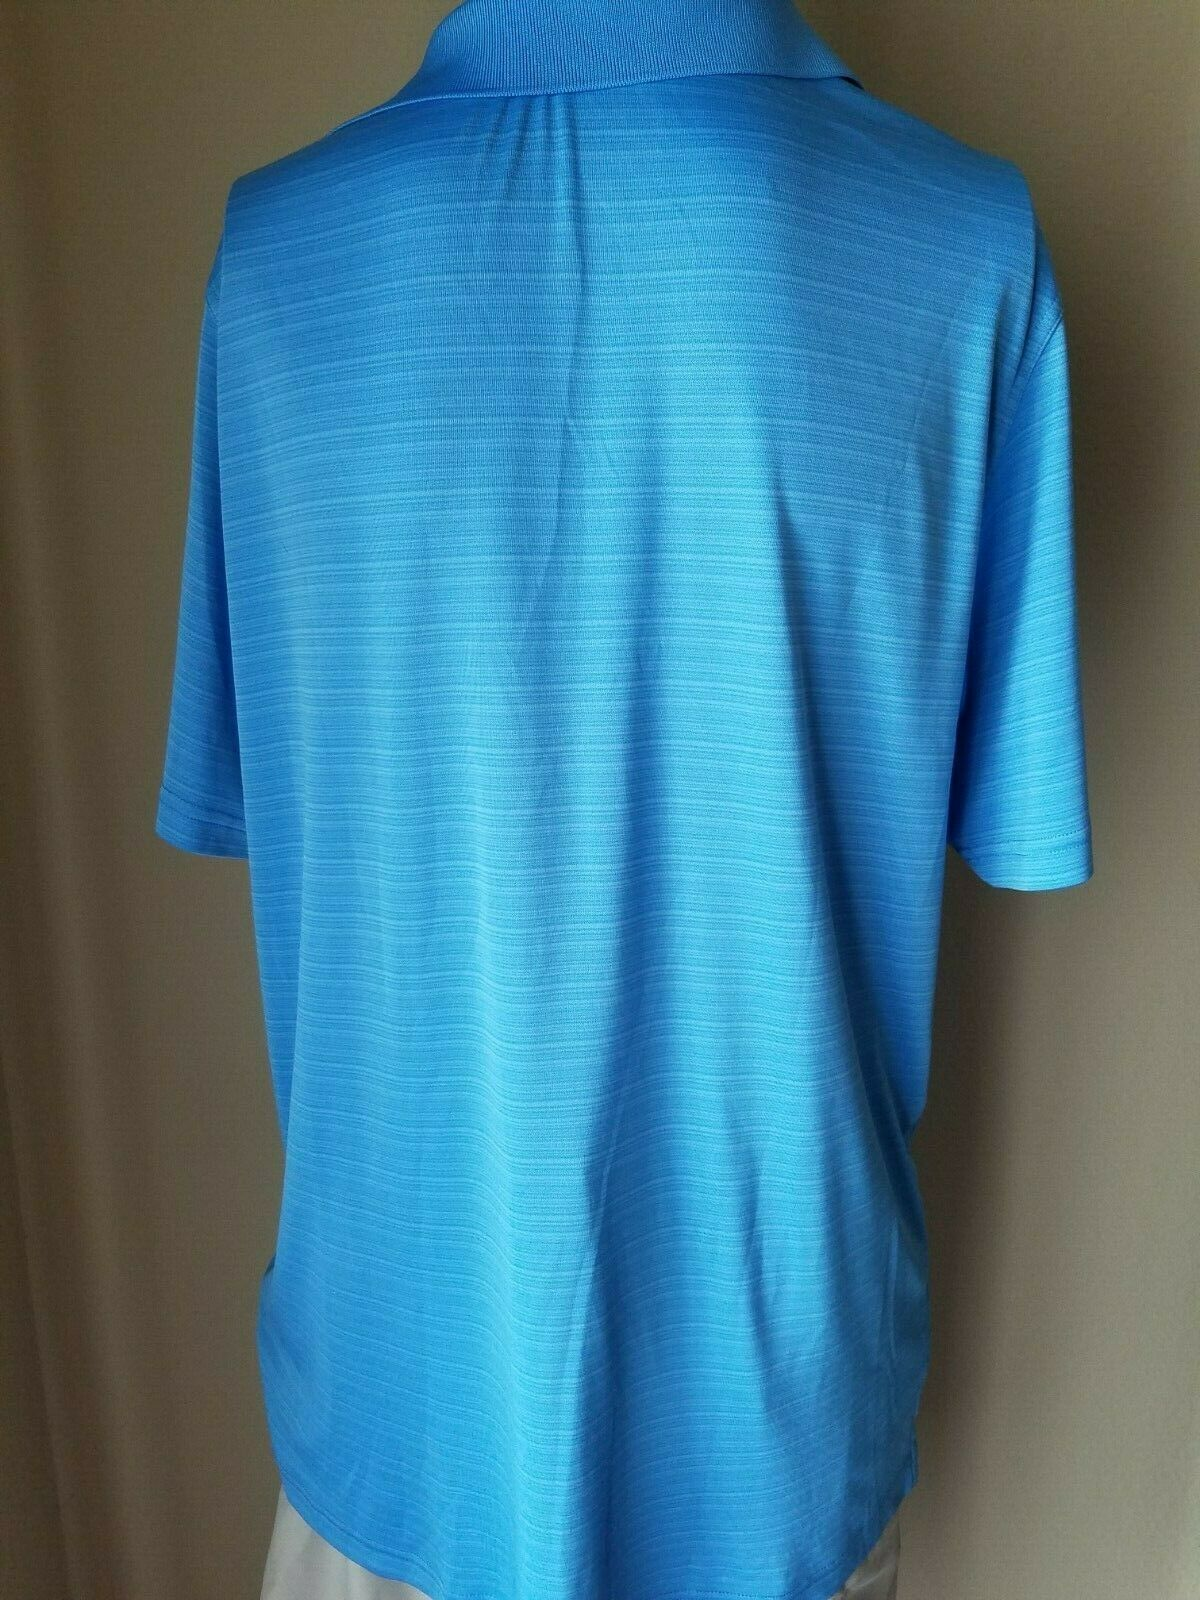 3 Uomo Polo Golf Camicie Ashworth Greg Norman Bobby Jones Blu Manica Corta XL